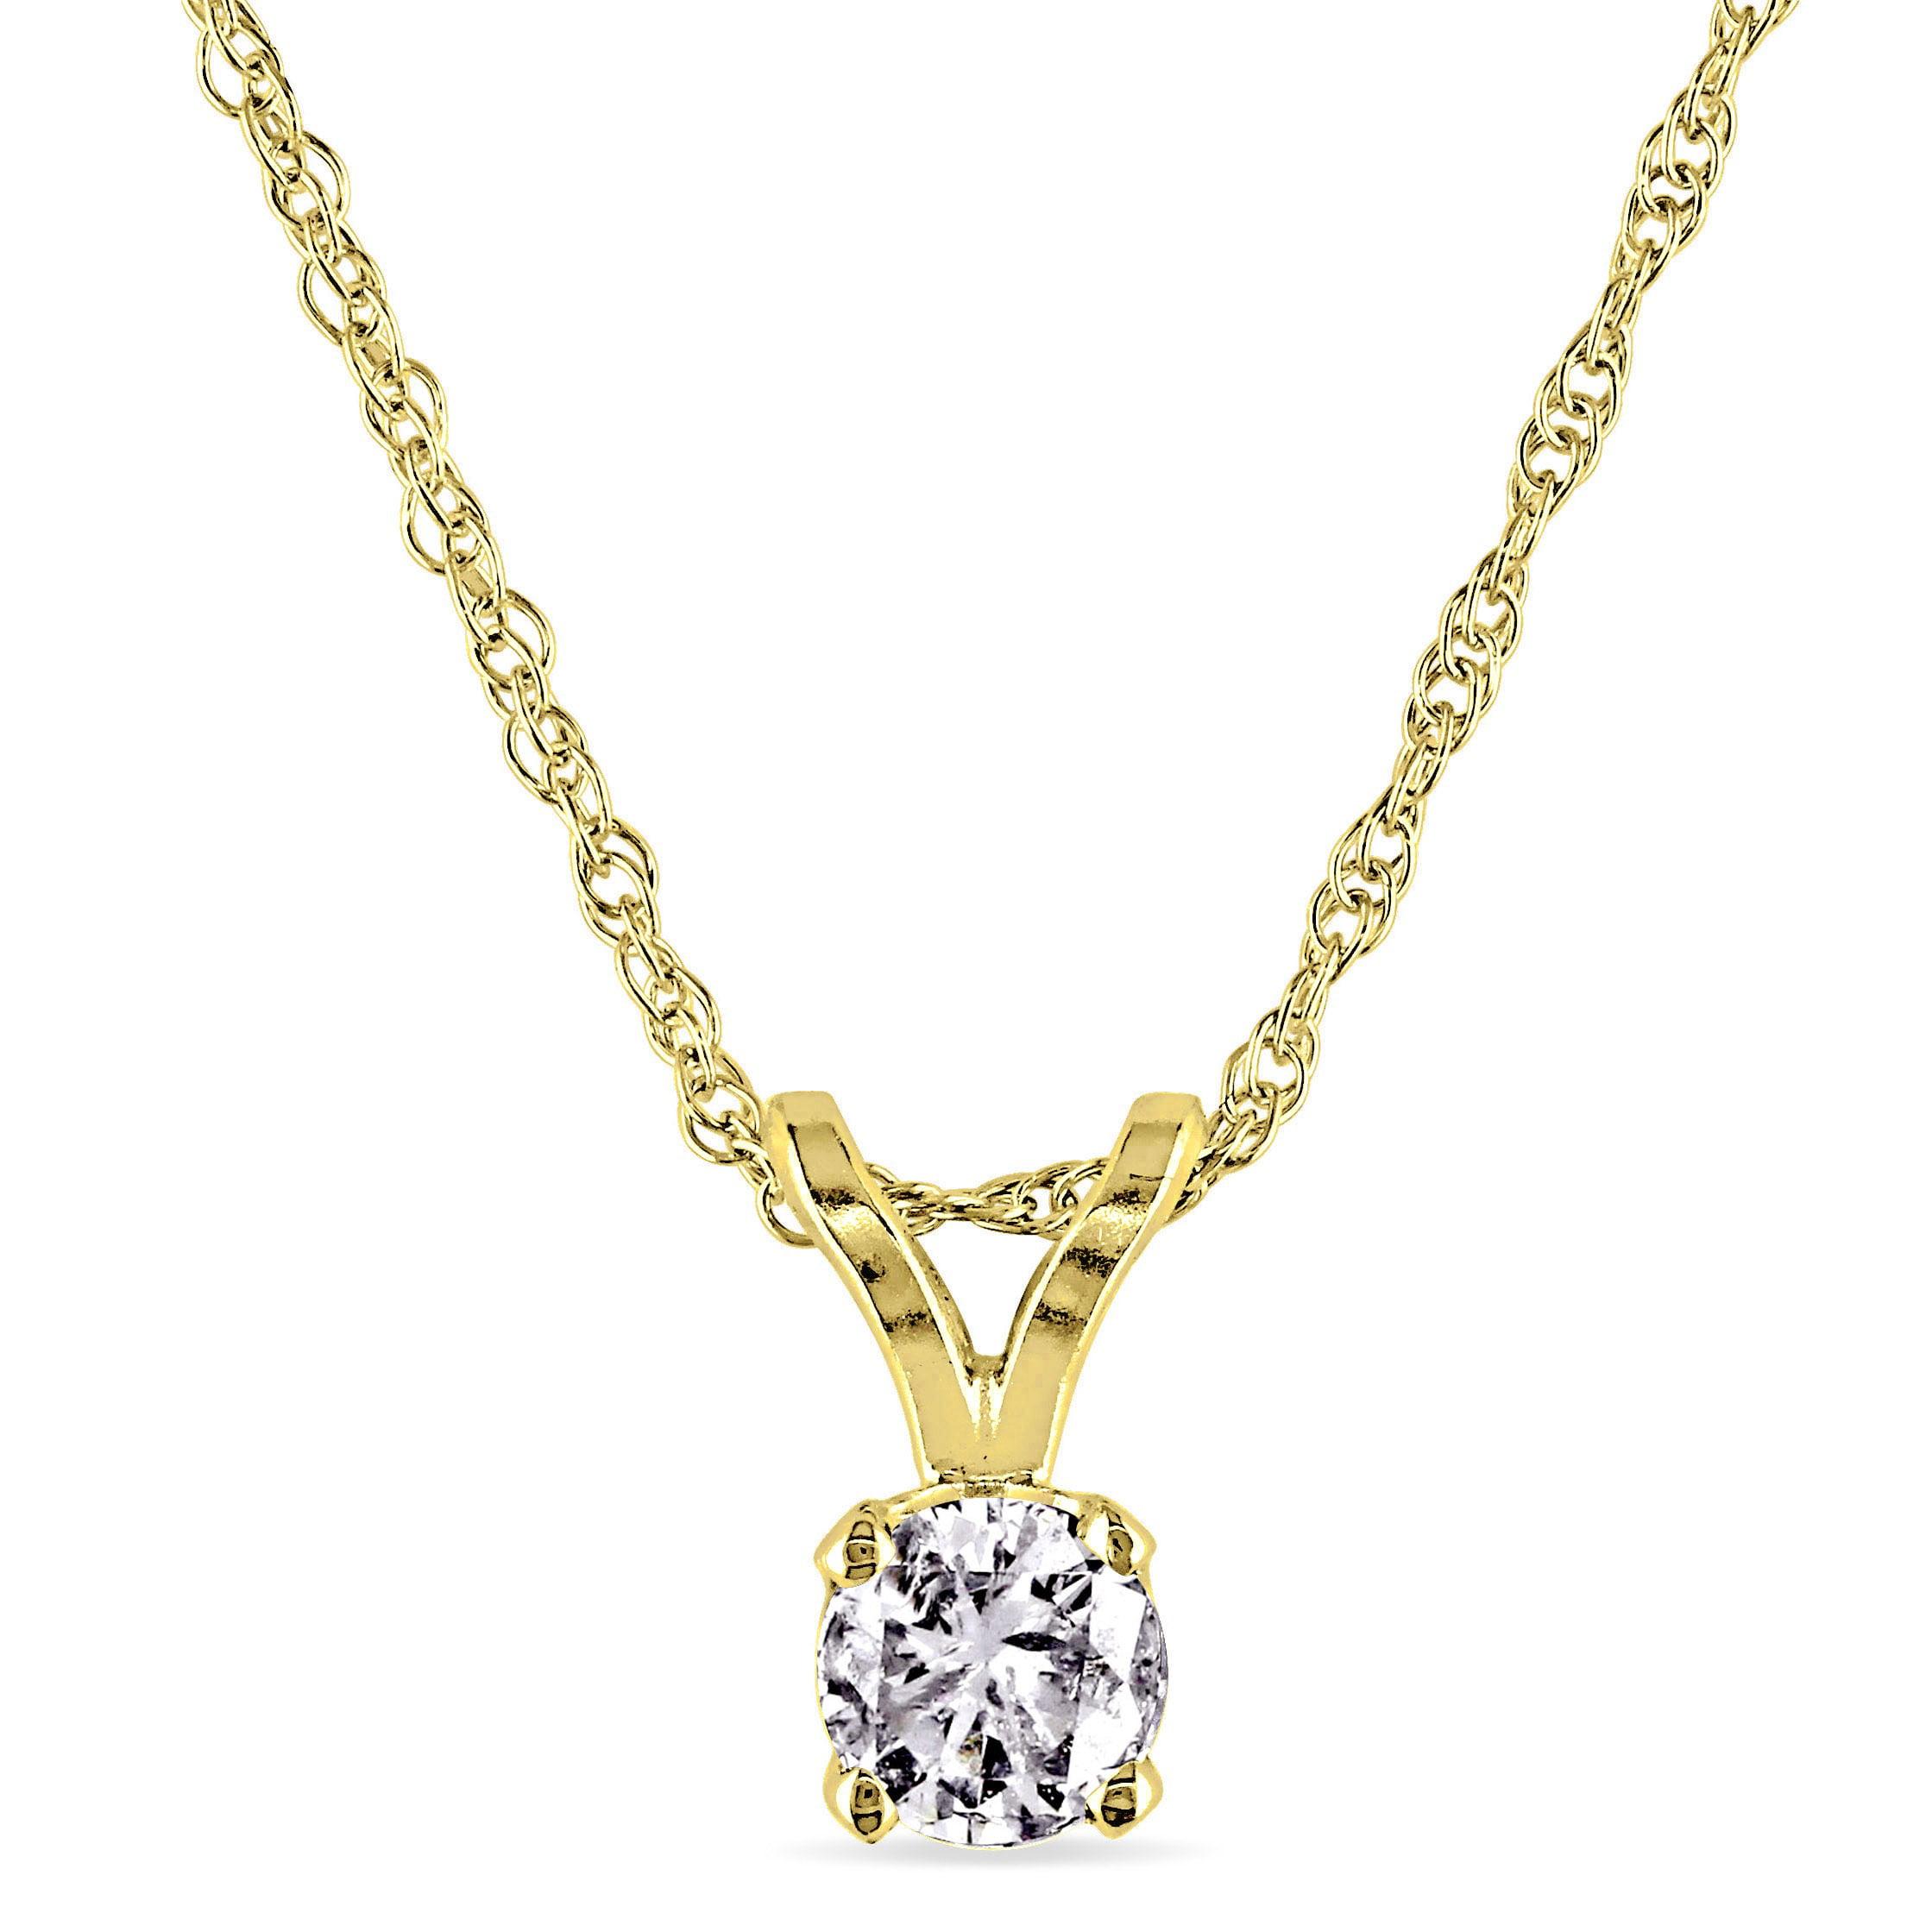 Miabella 1/6 Carat T.W. Diamond 14kt Yellow Gold Solitaire Pendant